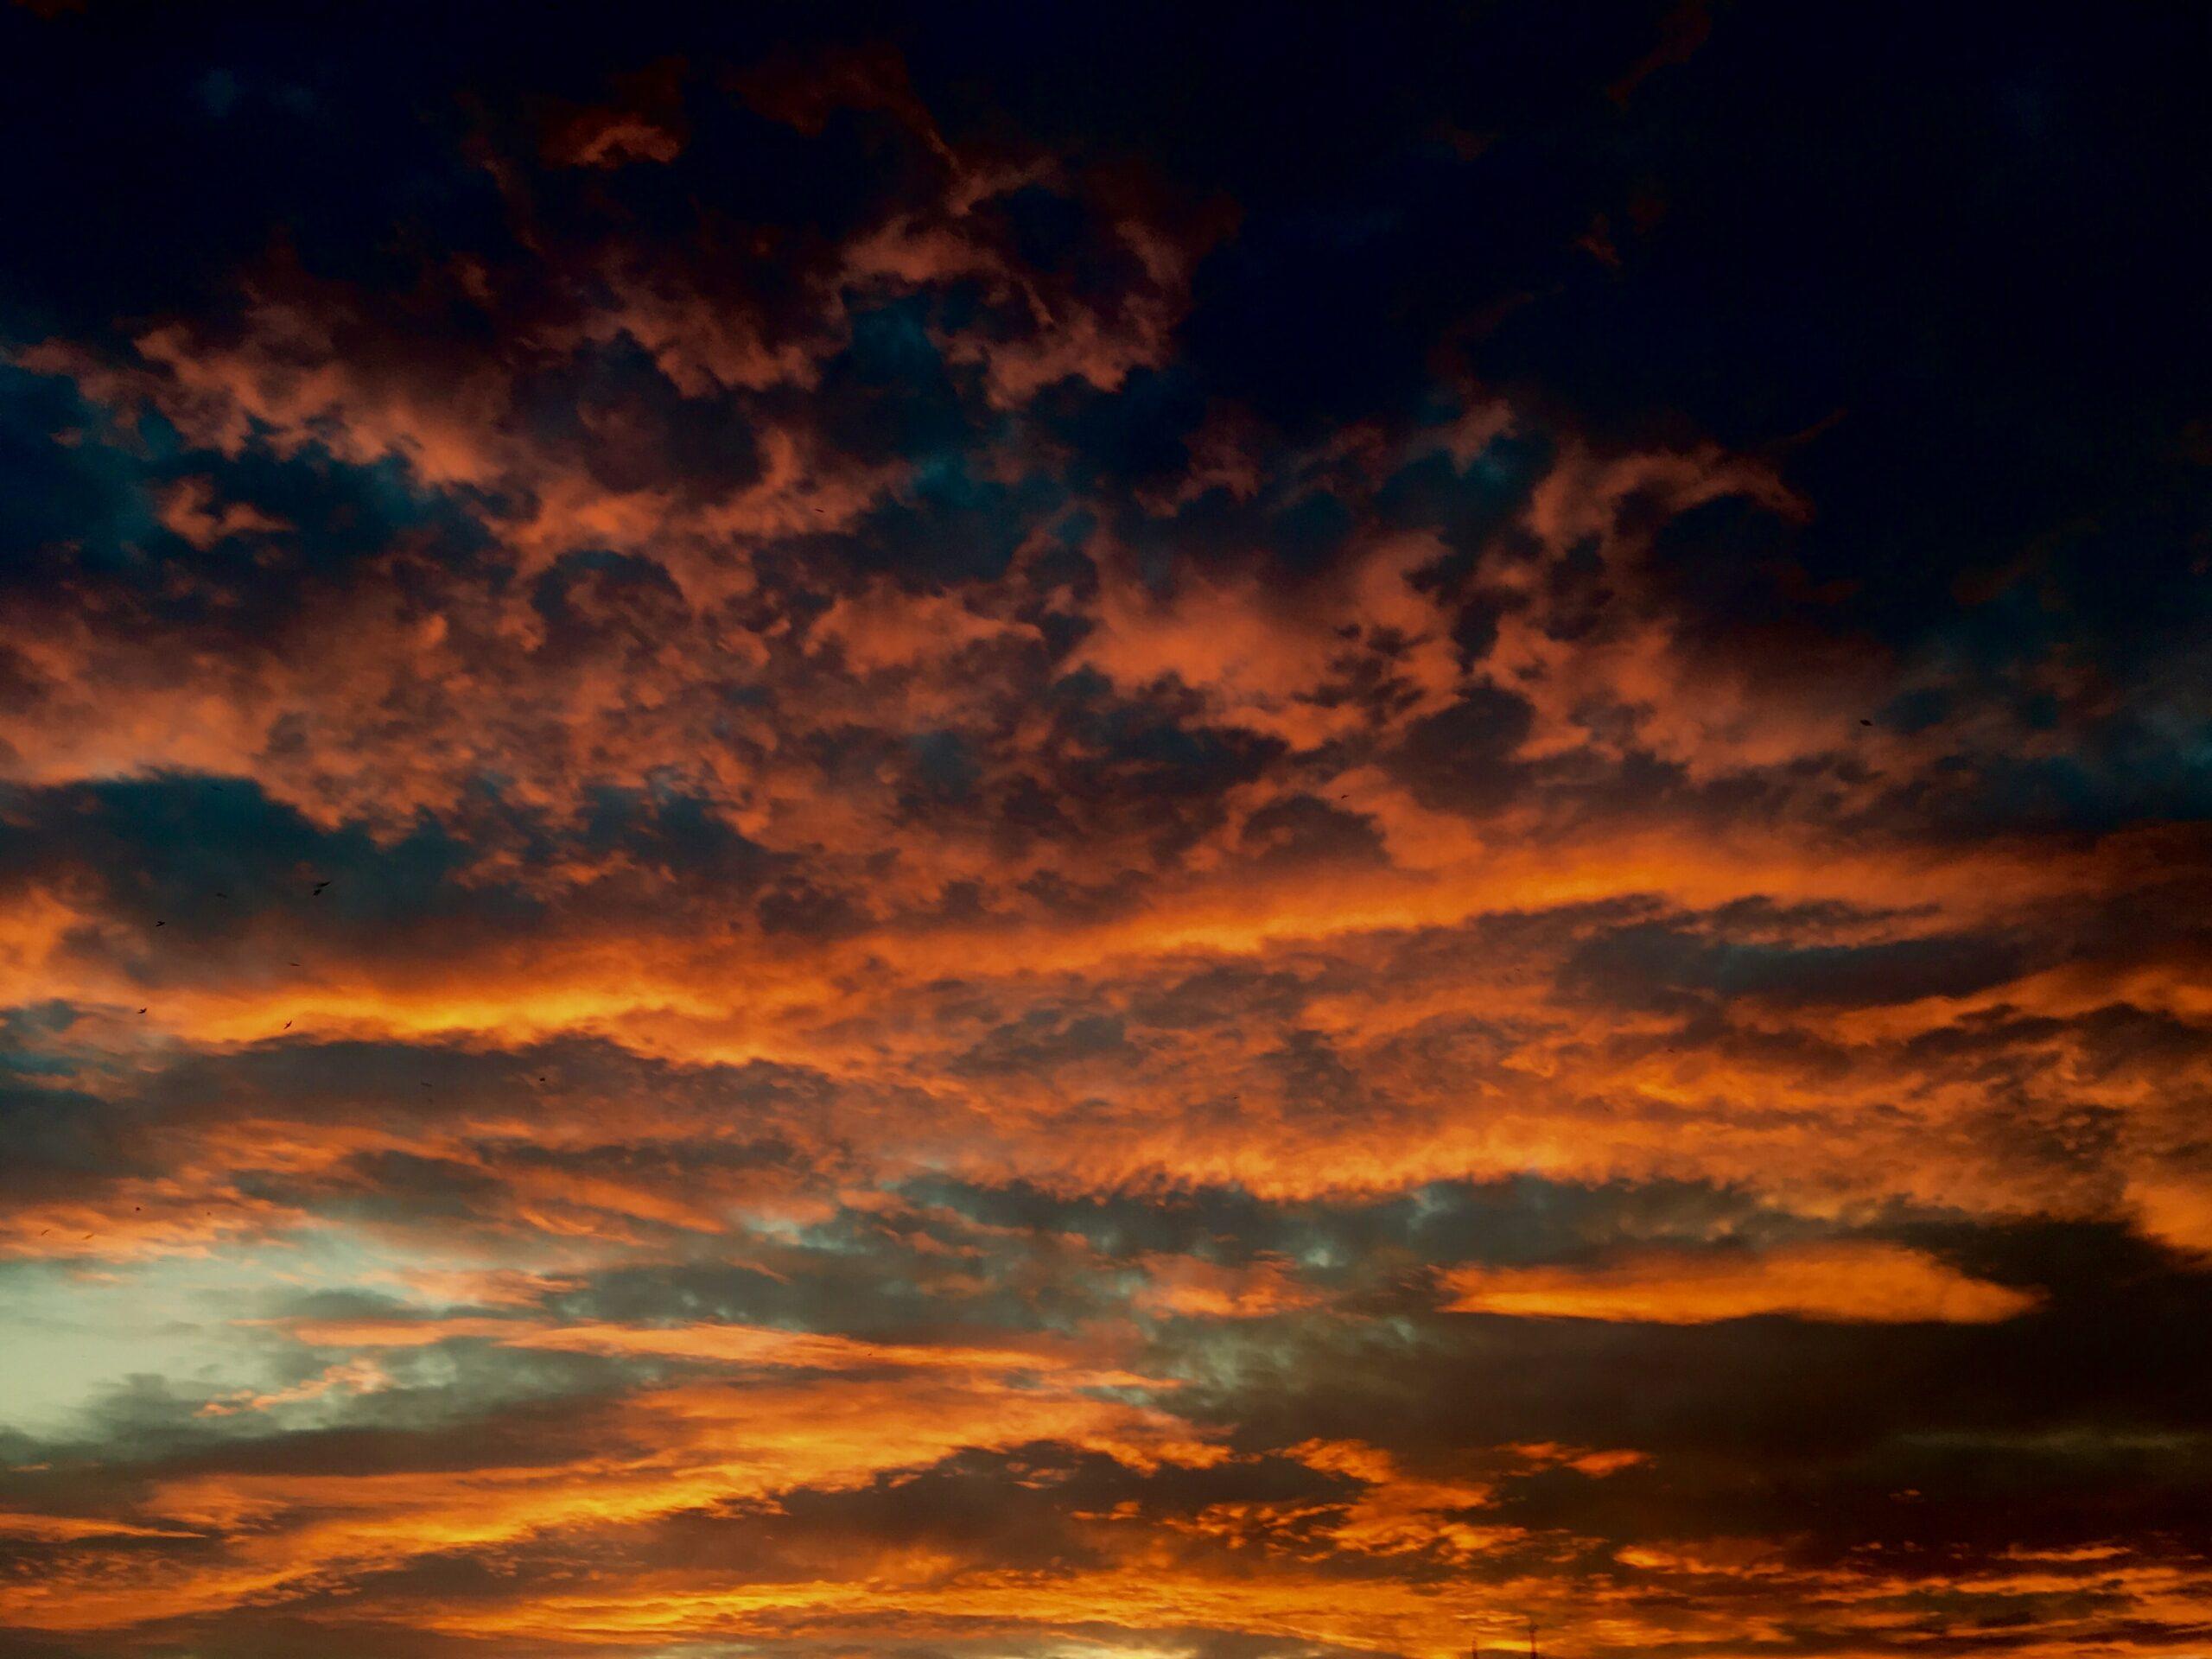 Bortom molnen lyser dioderna gula